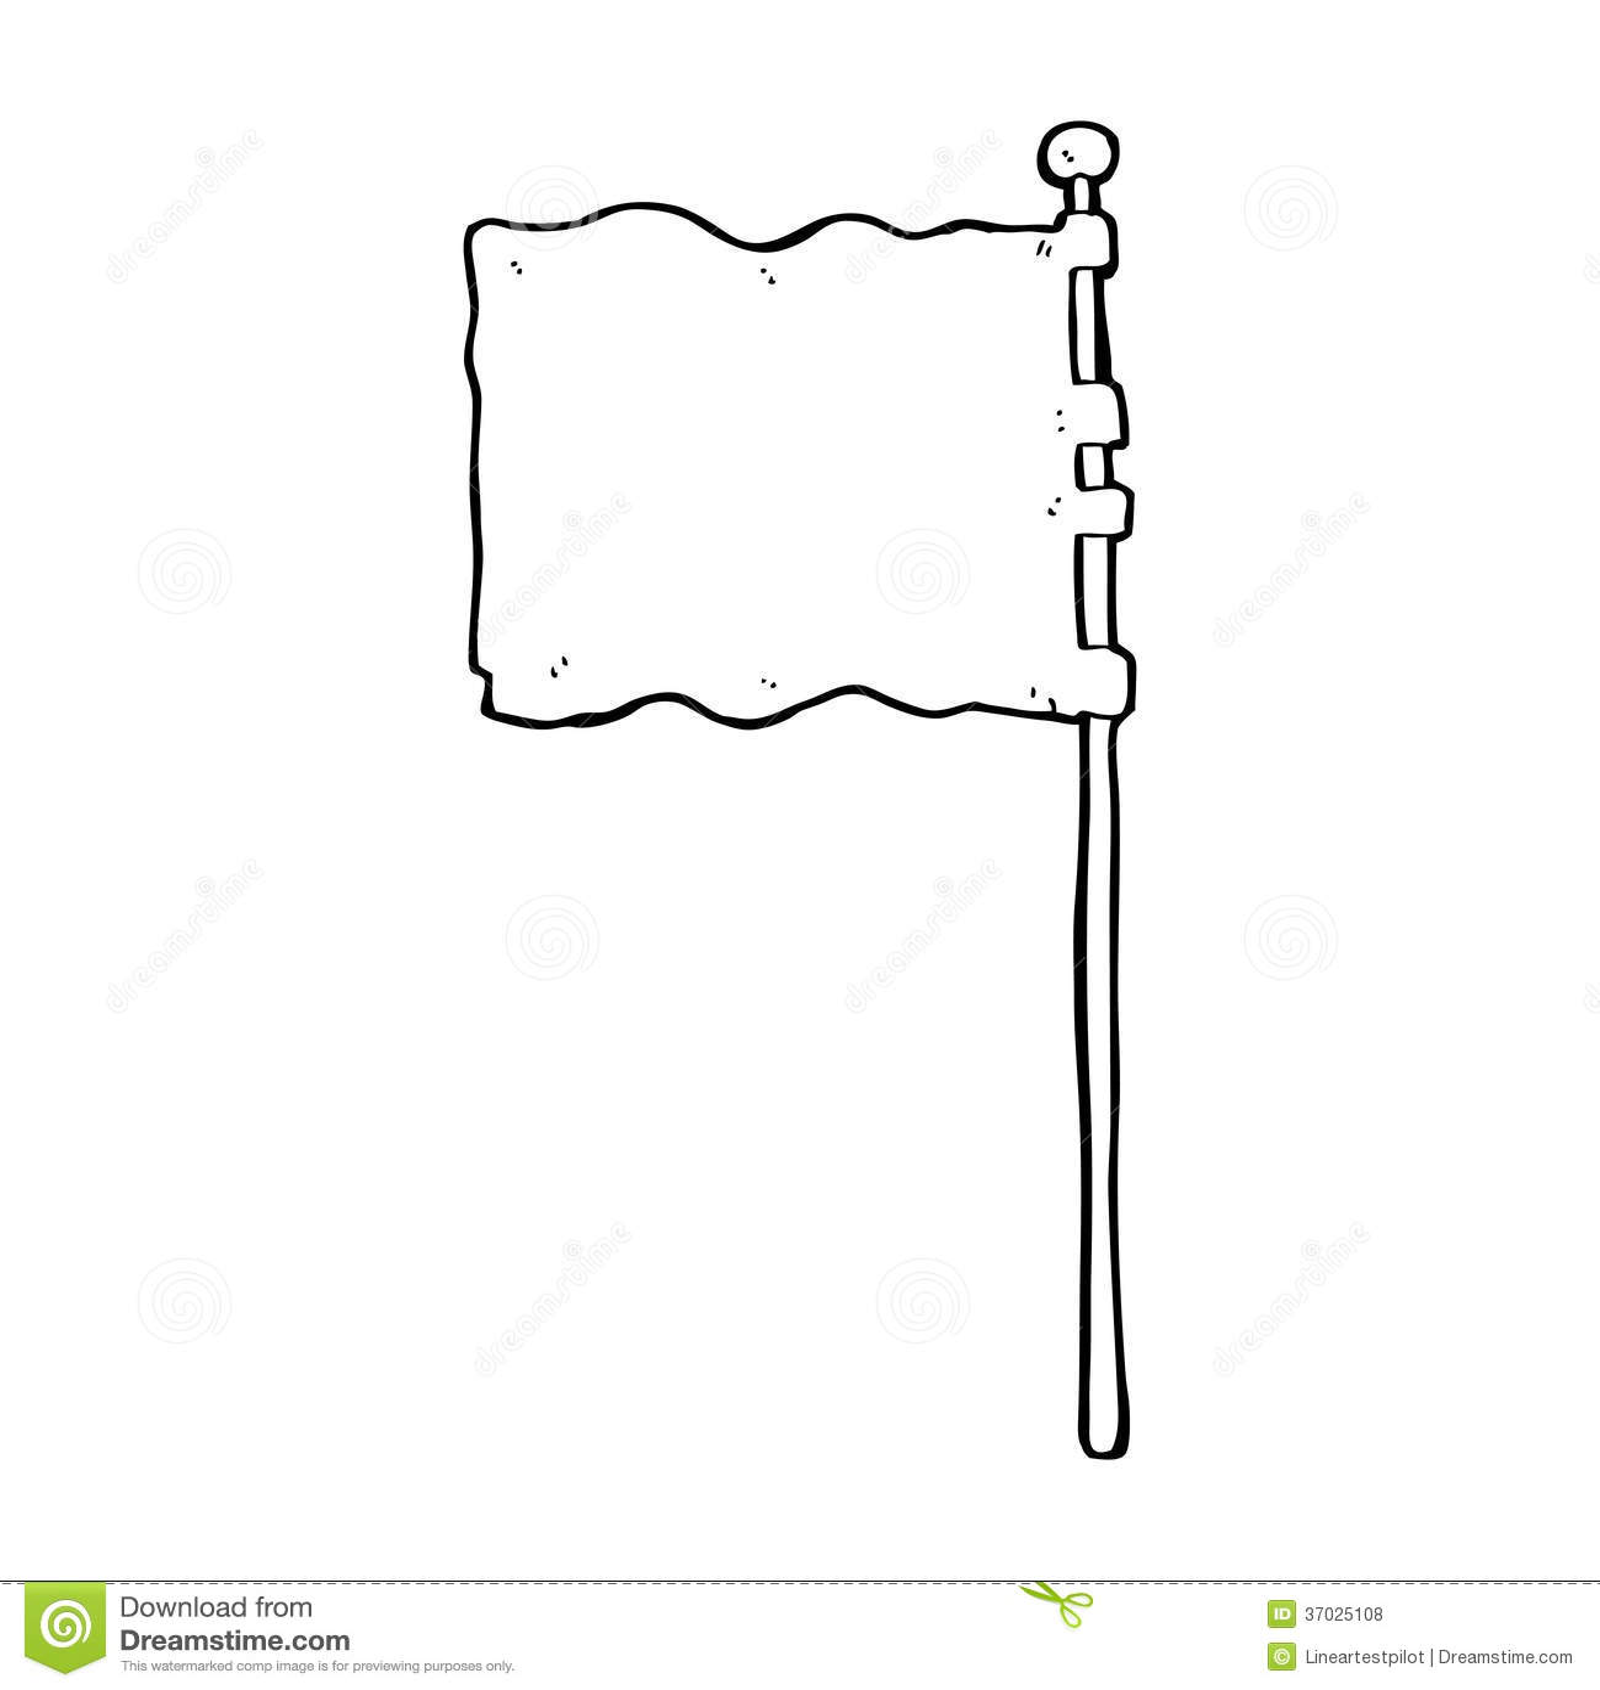 cartoon waving flag royalty free stock photos image 37025108